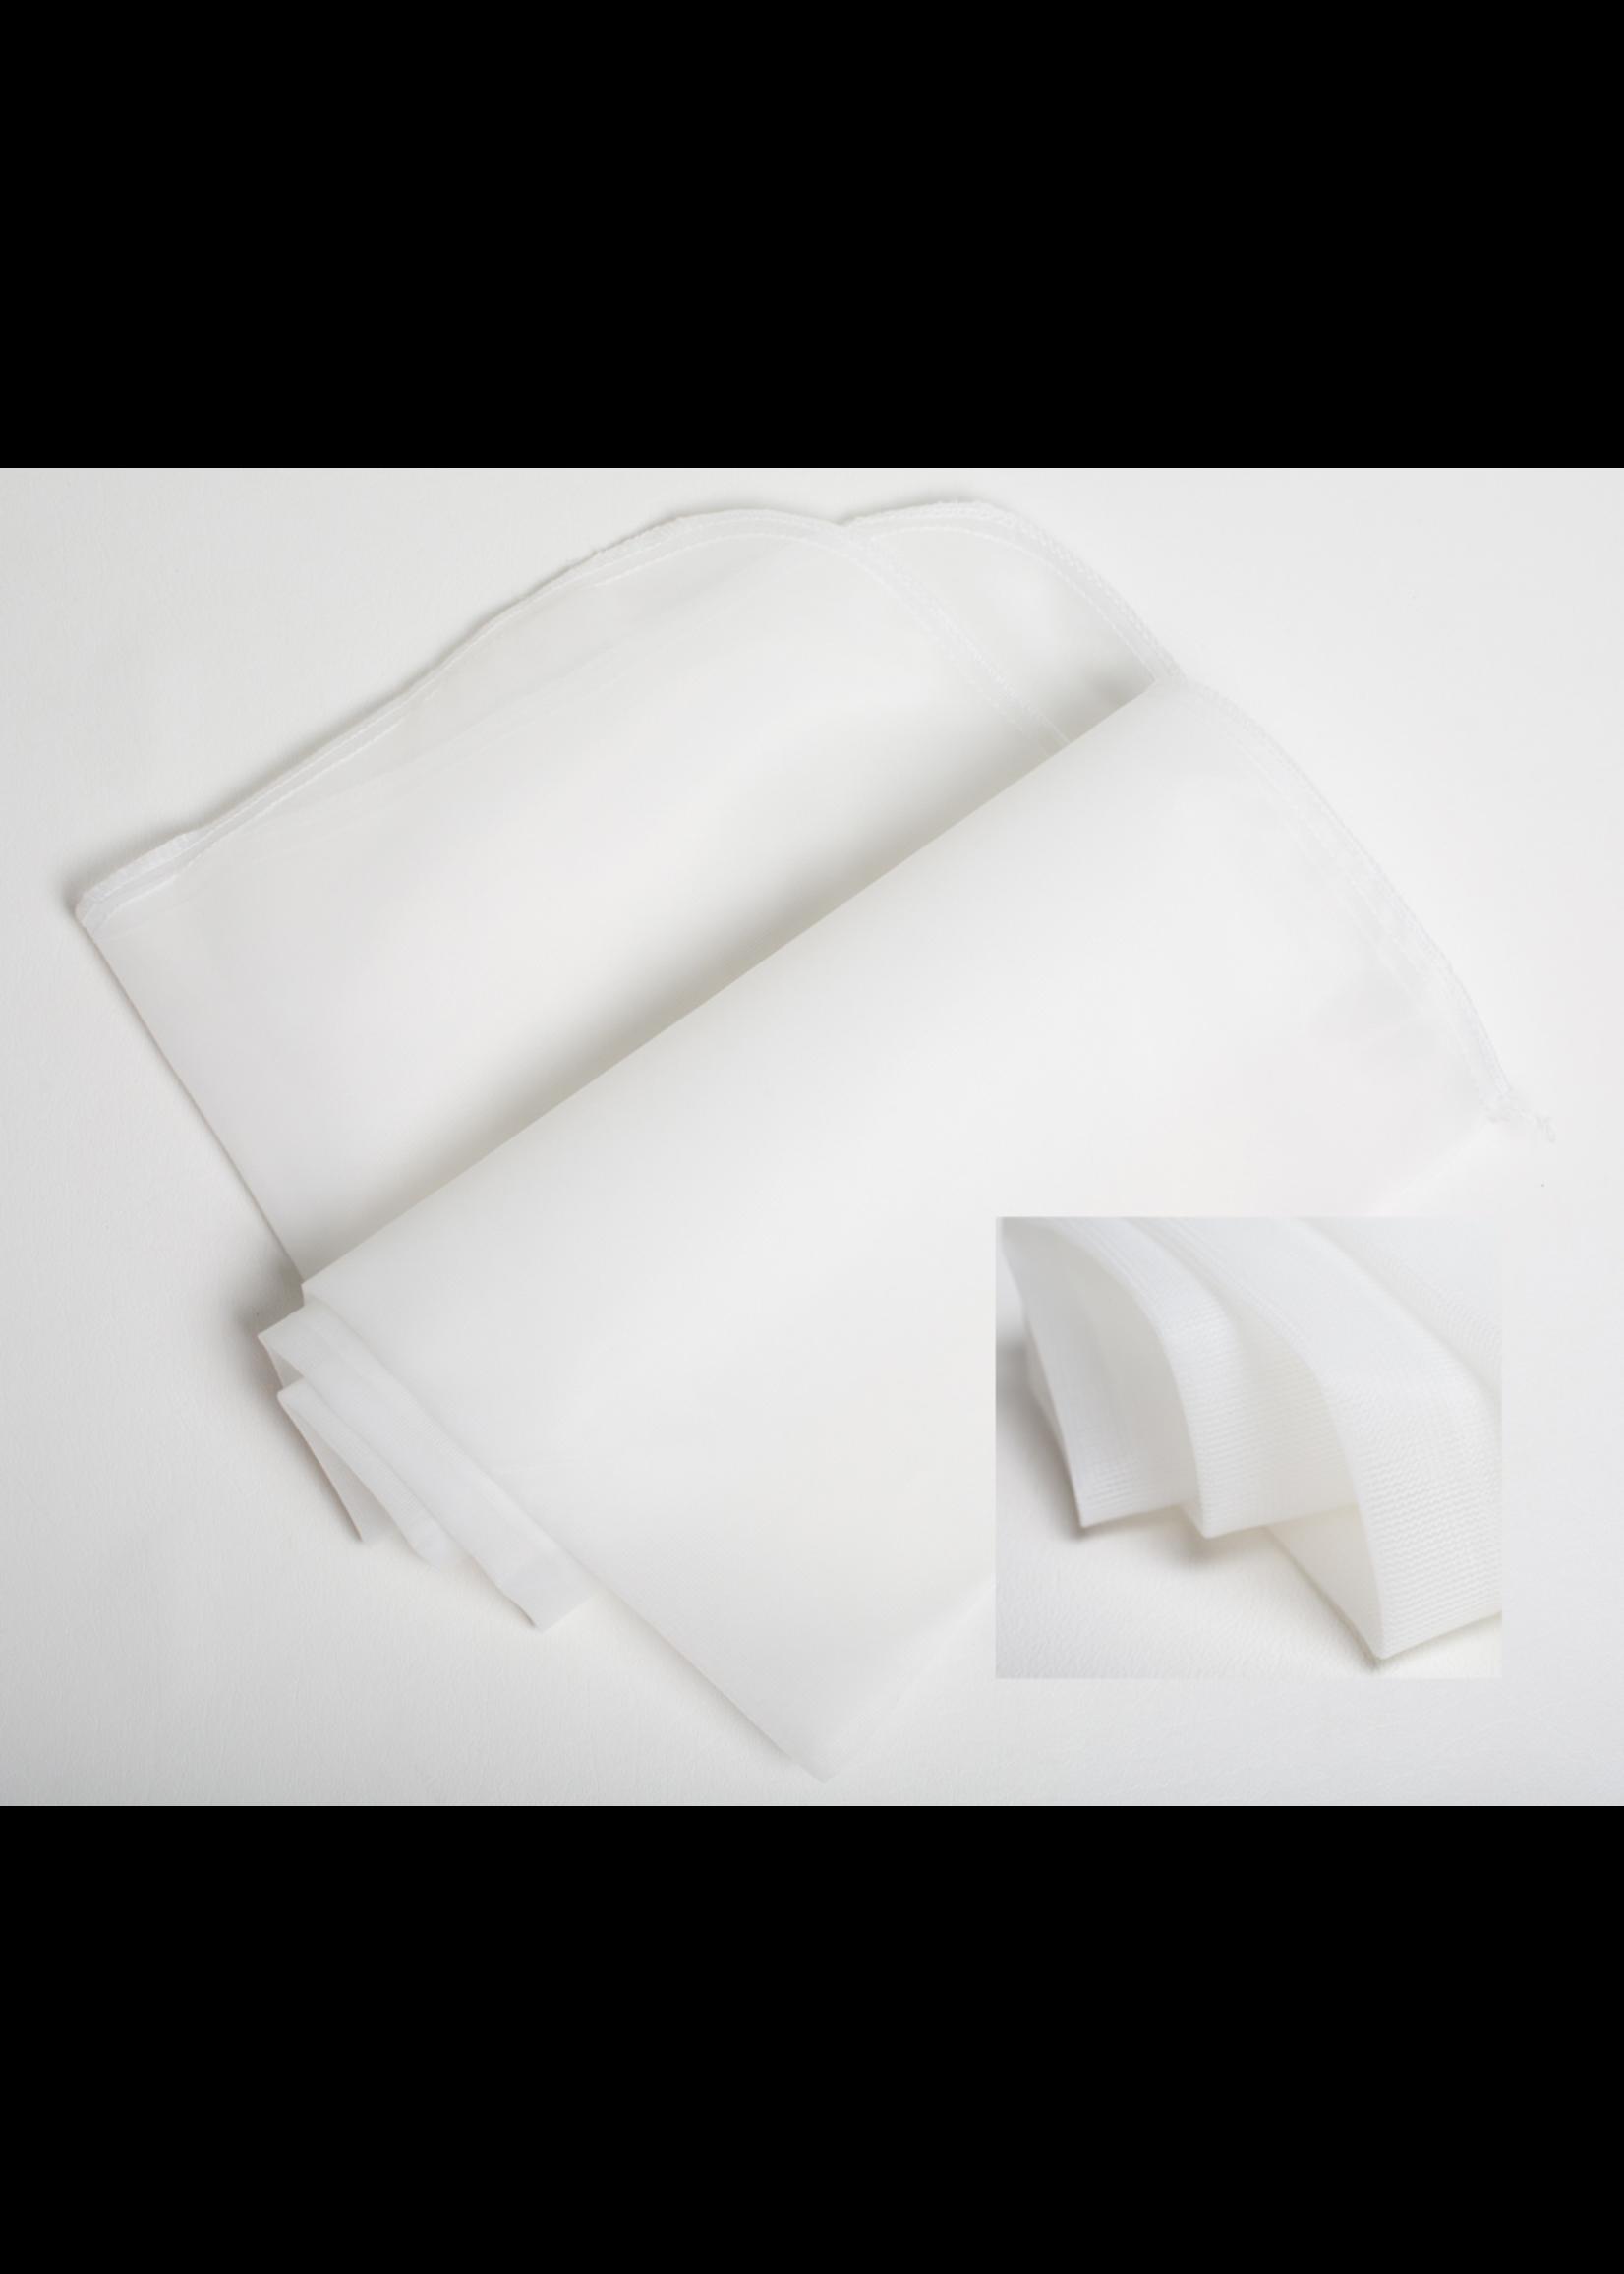 Brewing Straining Bag, Nylon - Large Coarse (2 x 3)